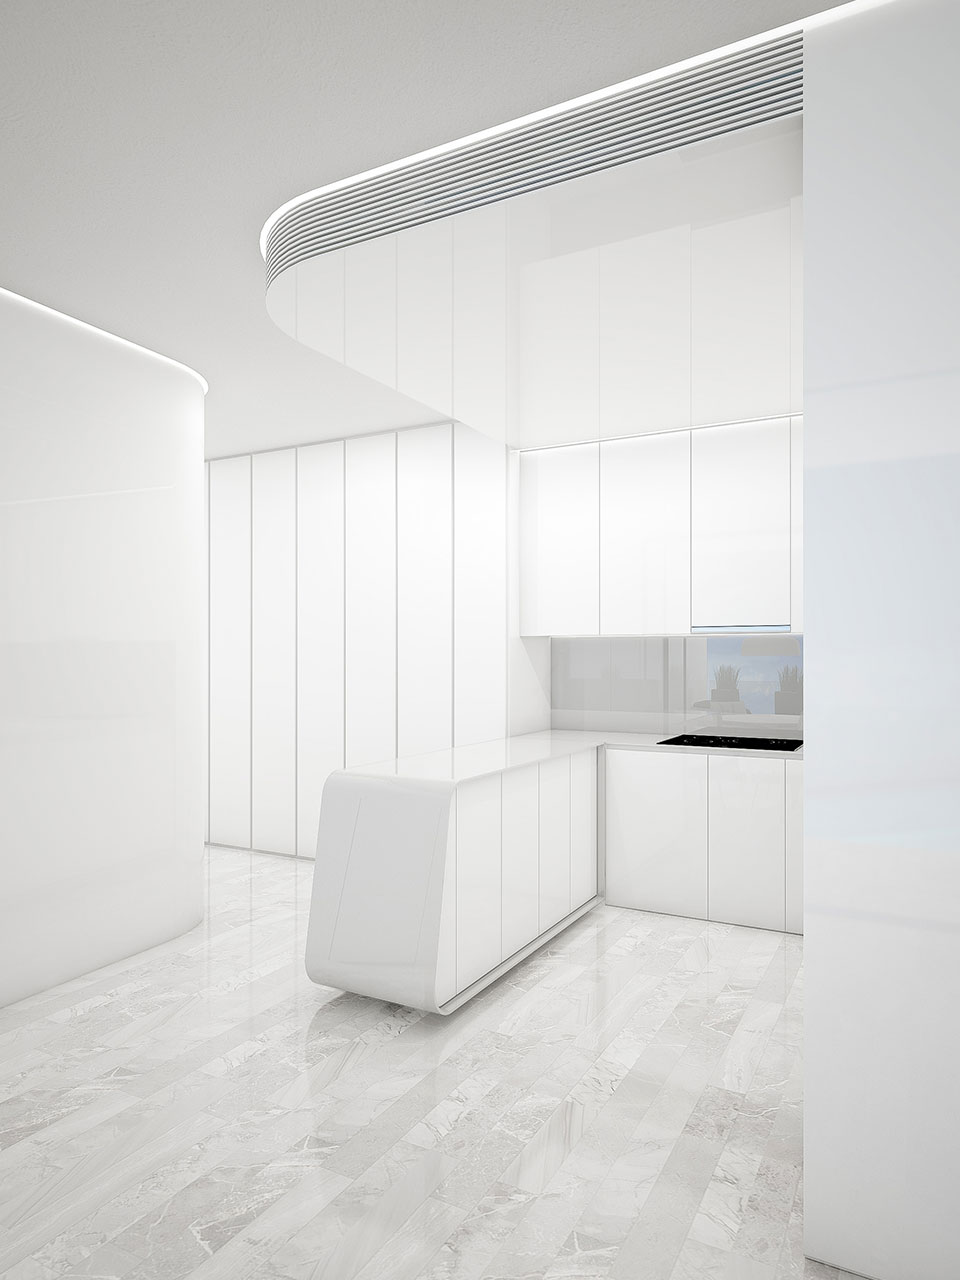 torres-sinforosa-interior1-grupo-baraka(960×1280)